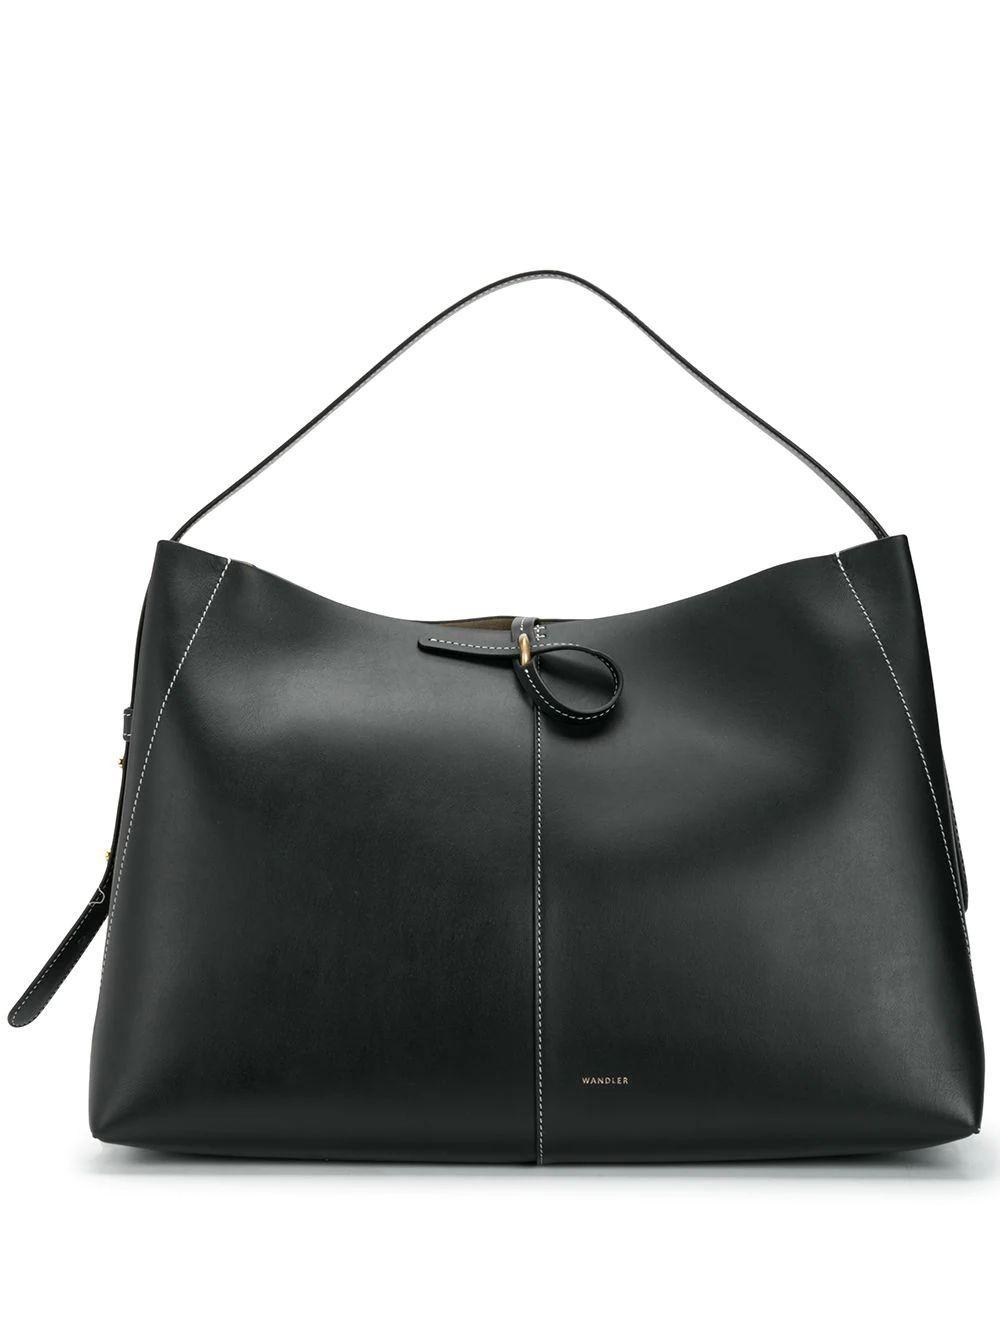 Ava Tote Bag Calf Leather Item # 20110-420101-3217